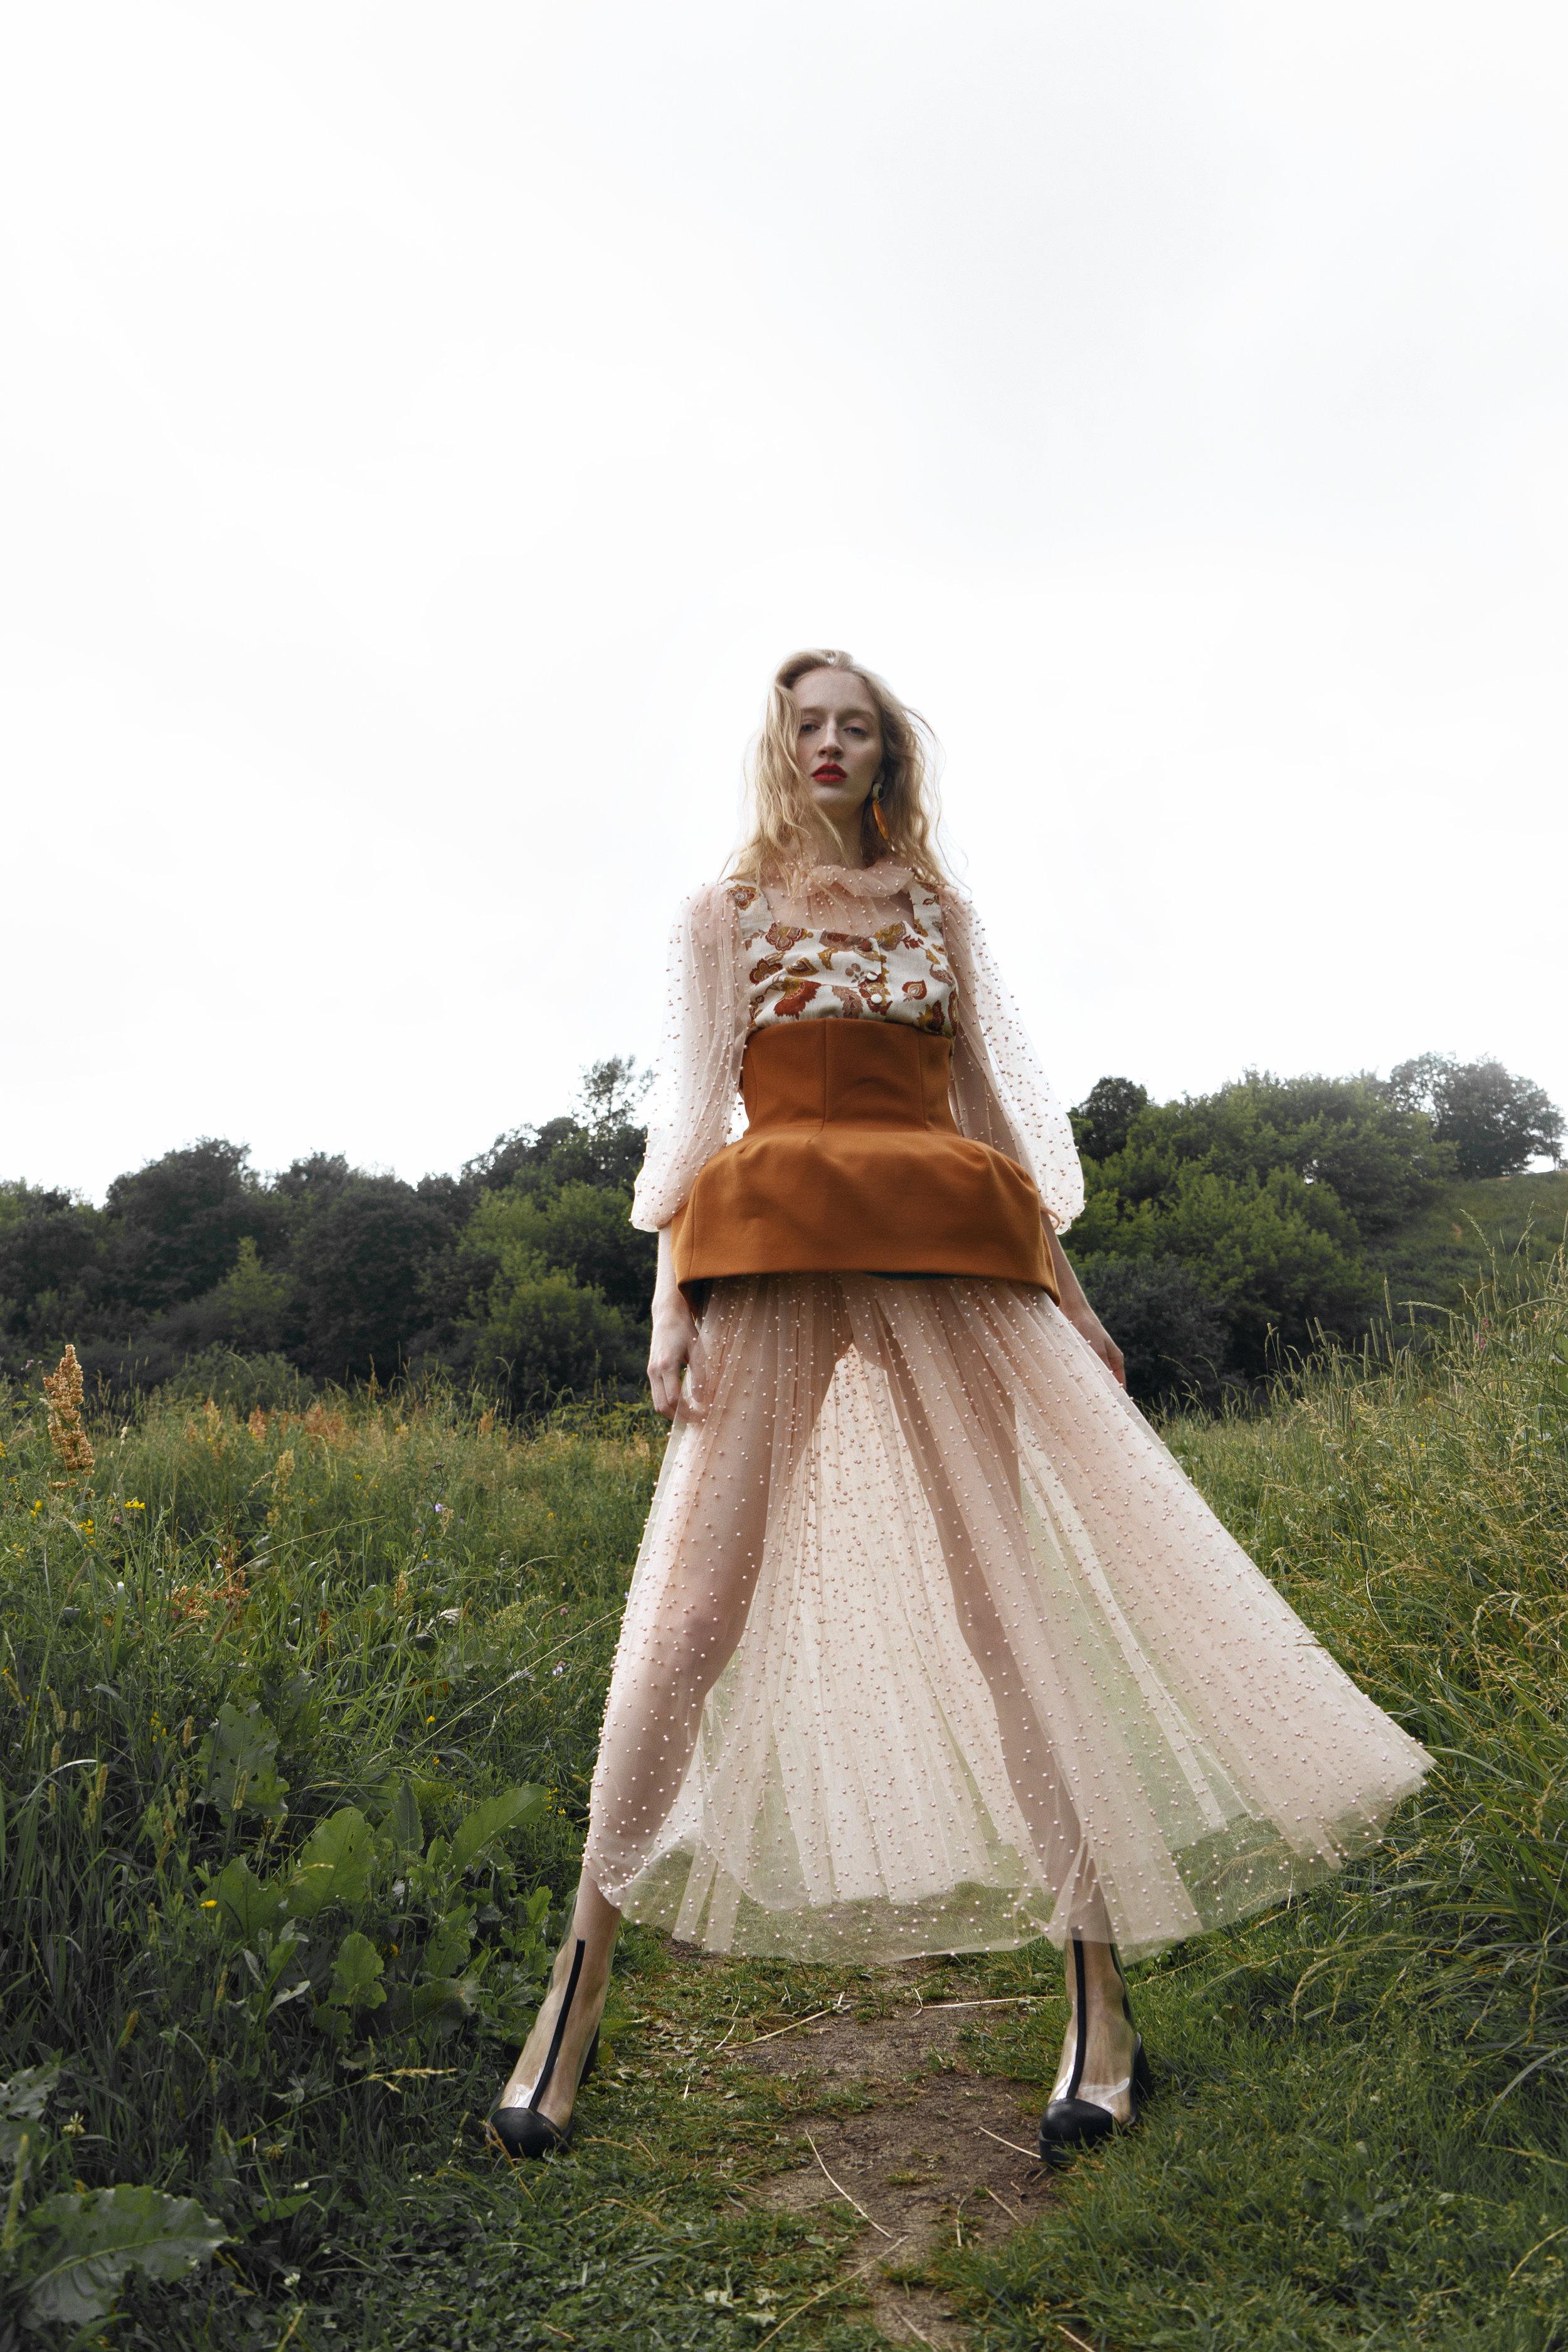 Dress and basque Marsel wear, top Volfson, boots Sintezia